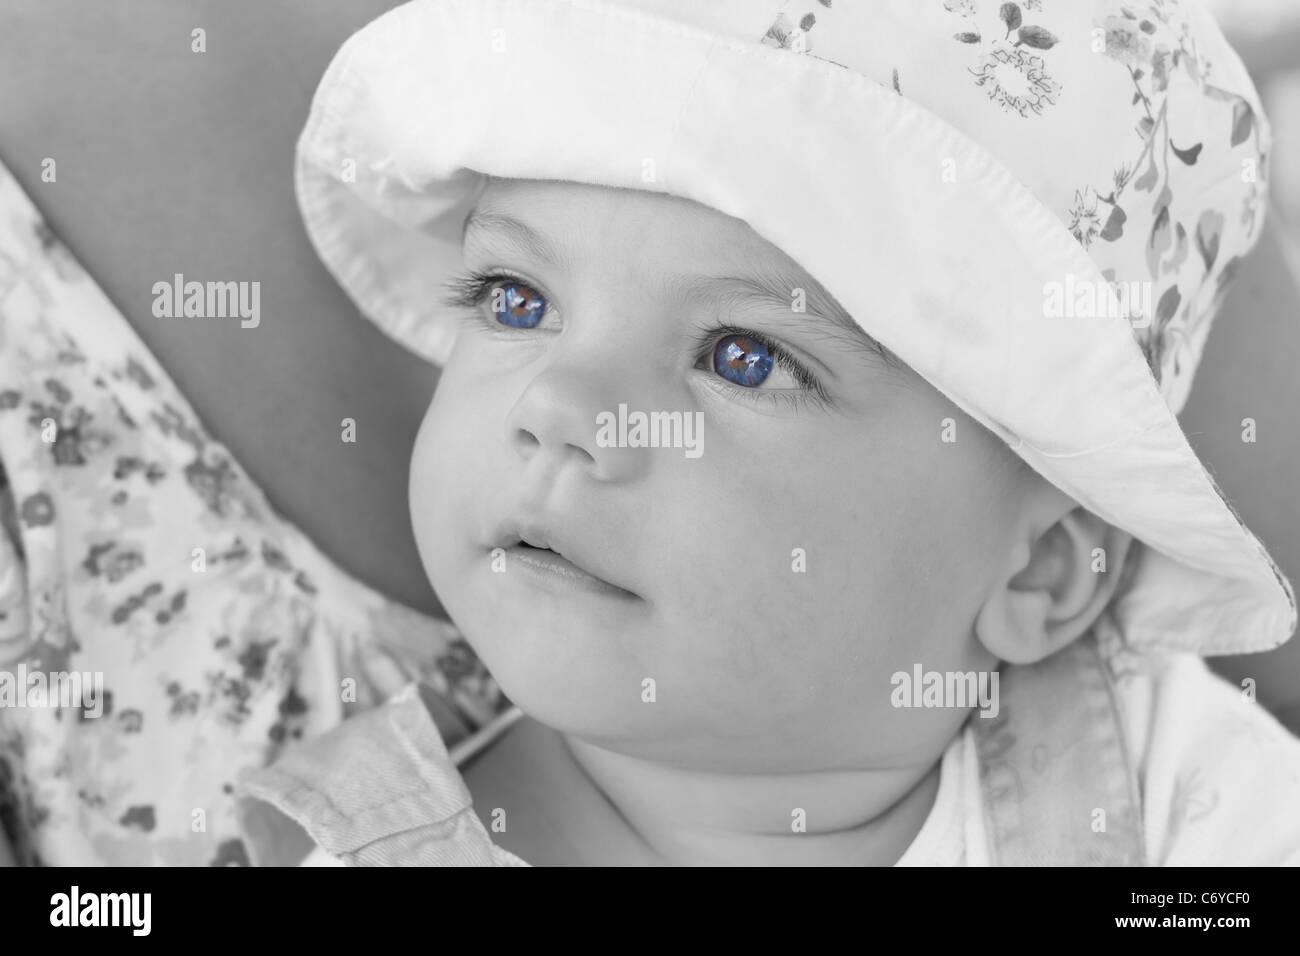 sweet baby girl with blue eyes stock photo: 38711204 - alamy